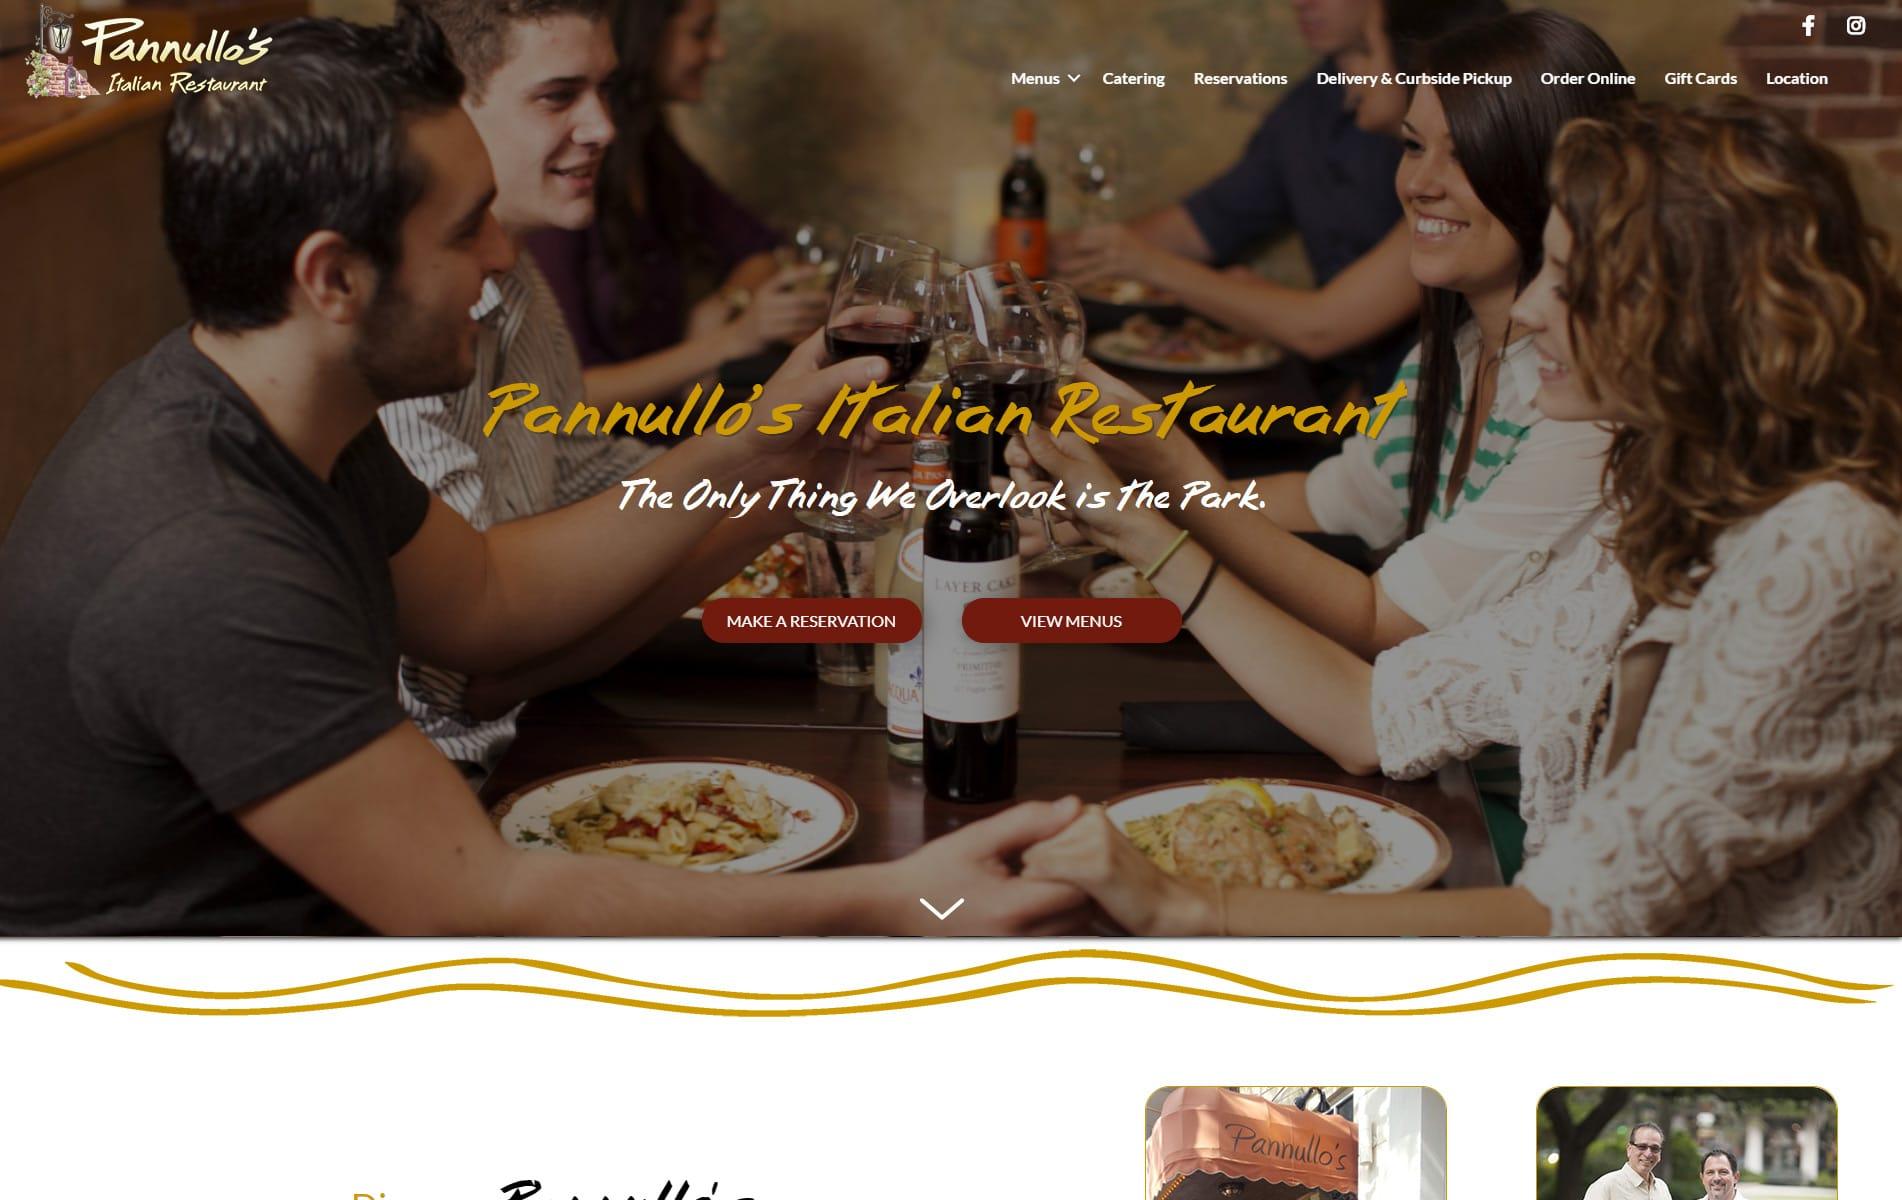 Screenshot of Pannullos Italian Restaurant Web Site